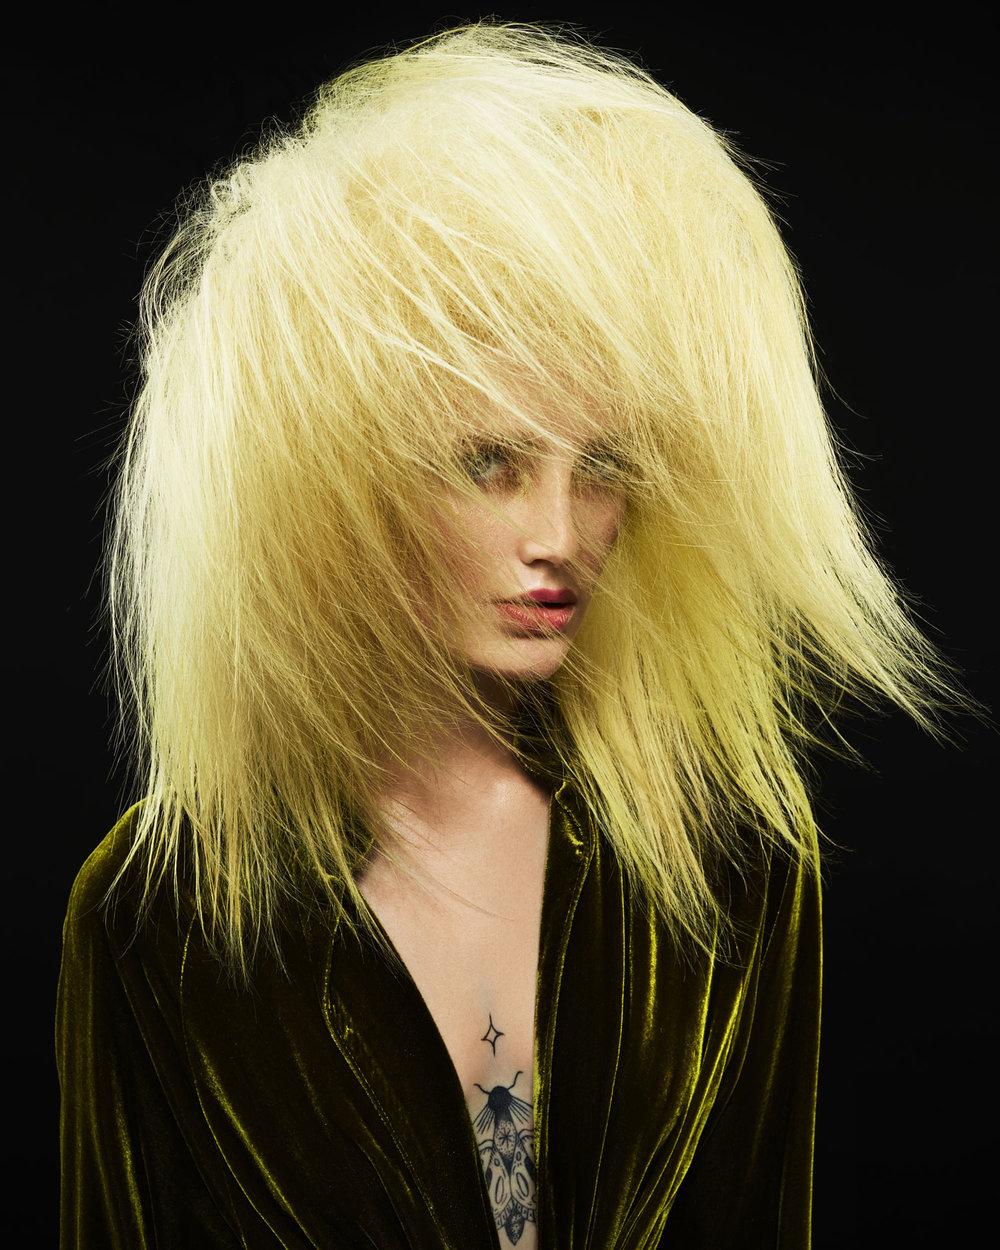 sarah-cochran-wardrobe-stylist-minneapolis-st-paul-creative-stylist-2.jpg